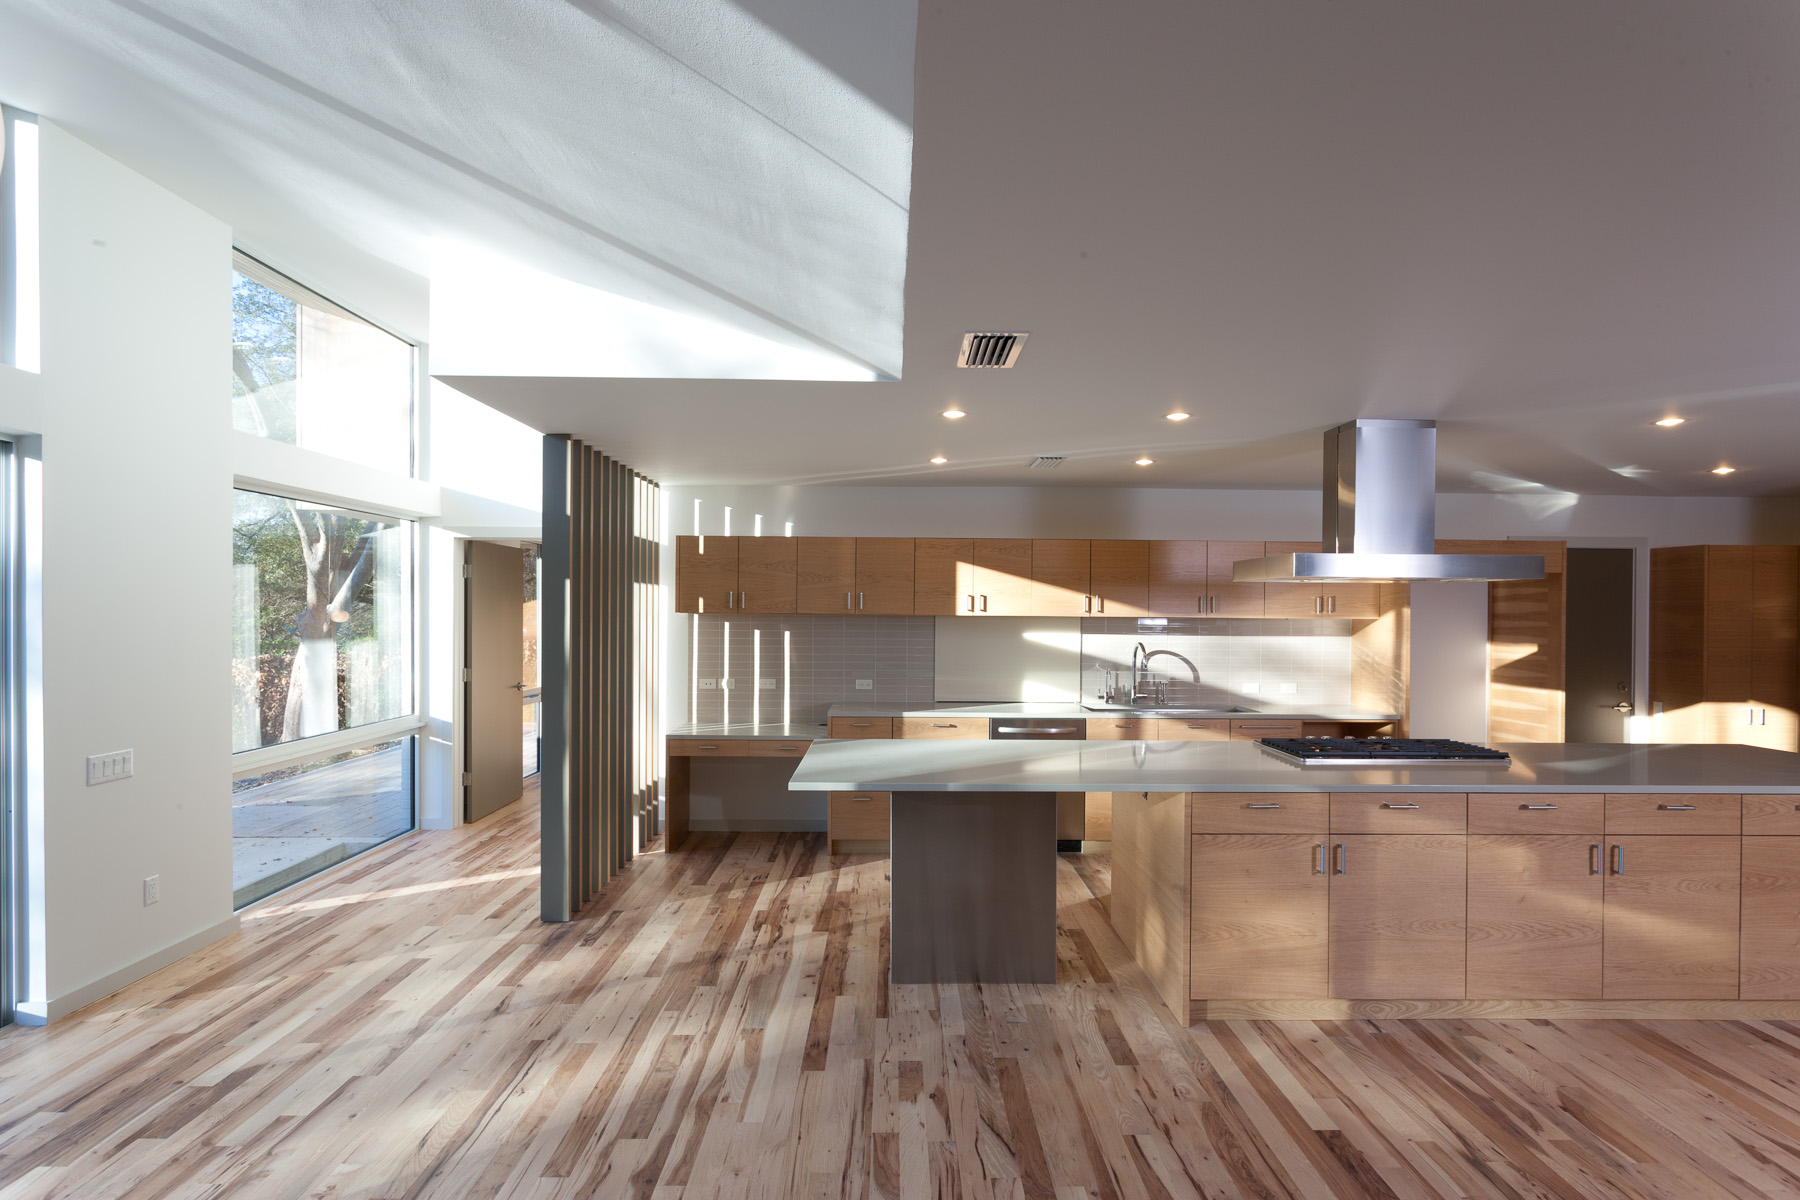 Webber + Studio